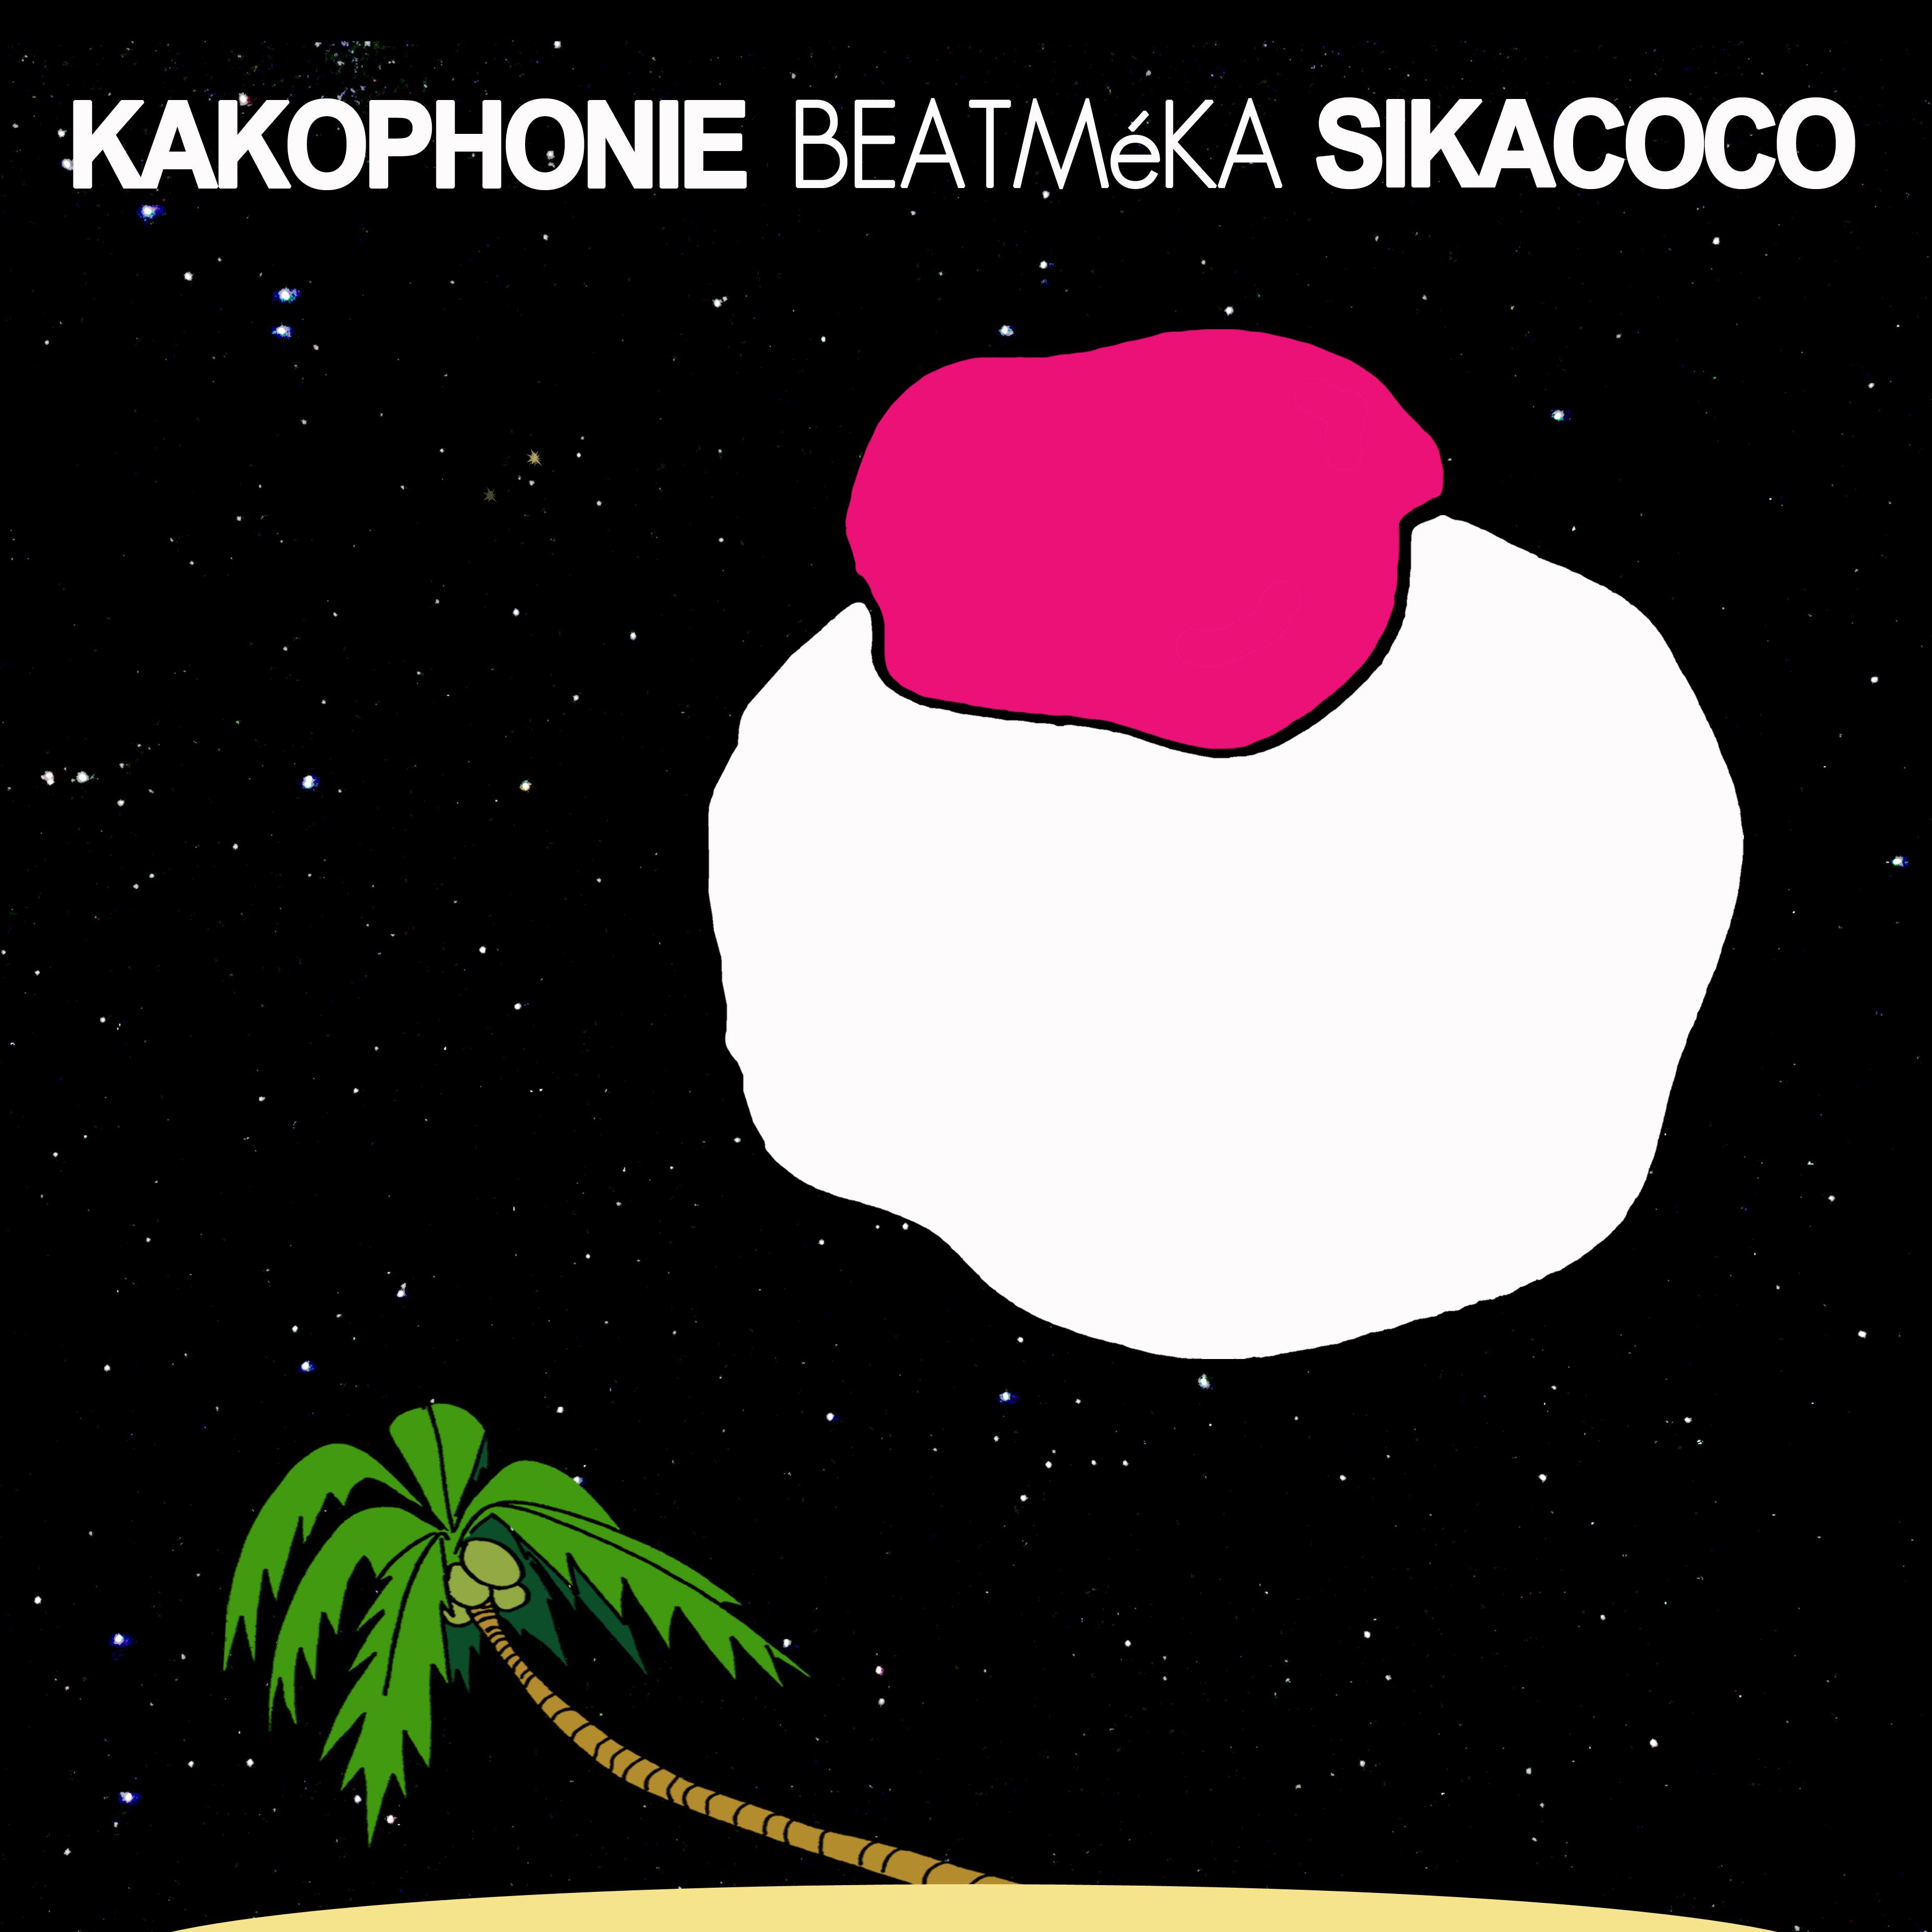 KakopHoniE bEatMéKa – SIKACOCO: A Caribbean Tribute To J DILLA